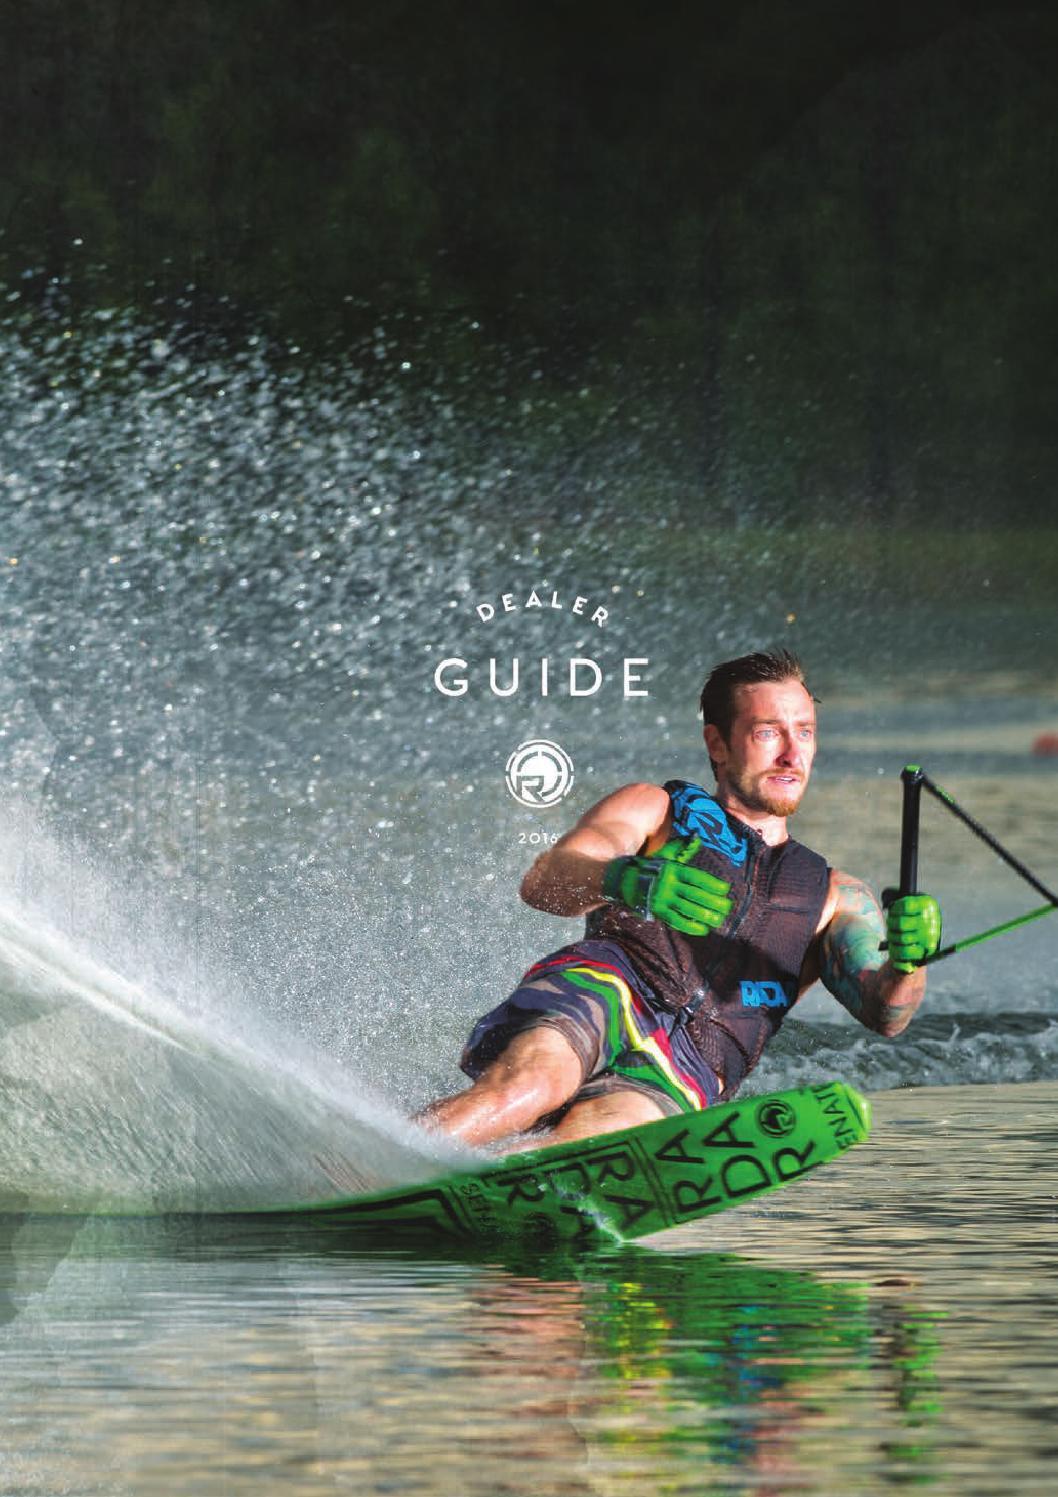 2018 Radar Skis Brochure By Watersports World Uk Issuu Water Ski Tow Harness 2016